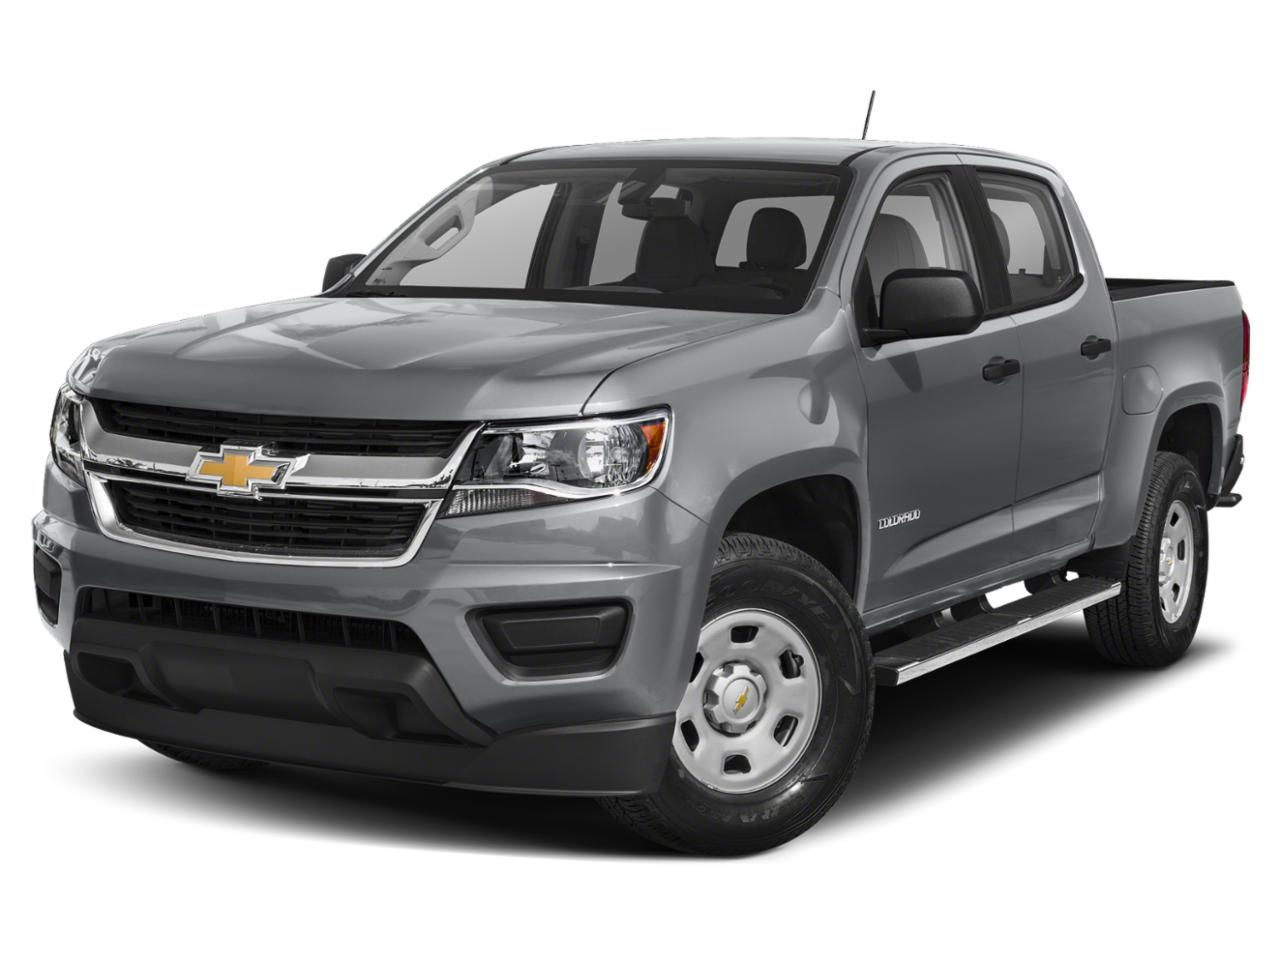 satin steel metallic 2020 Chevrolet Colorado LT Crew Cab Pickup Lexington NC